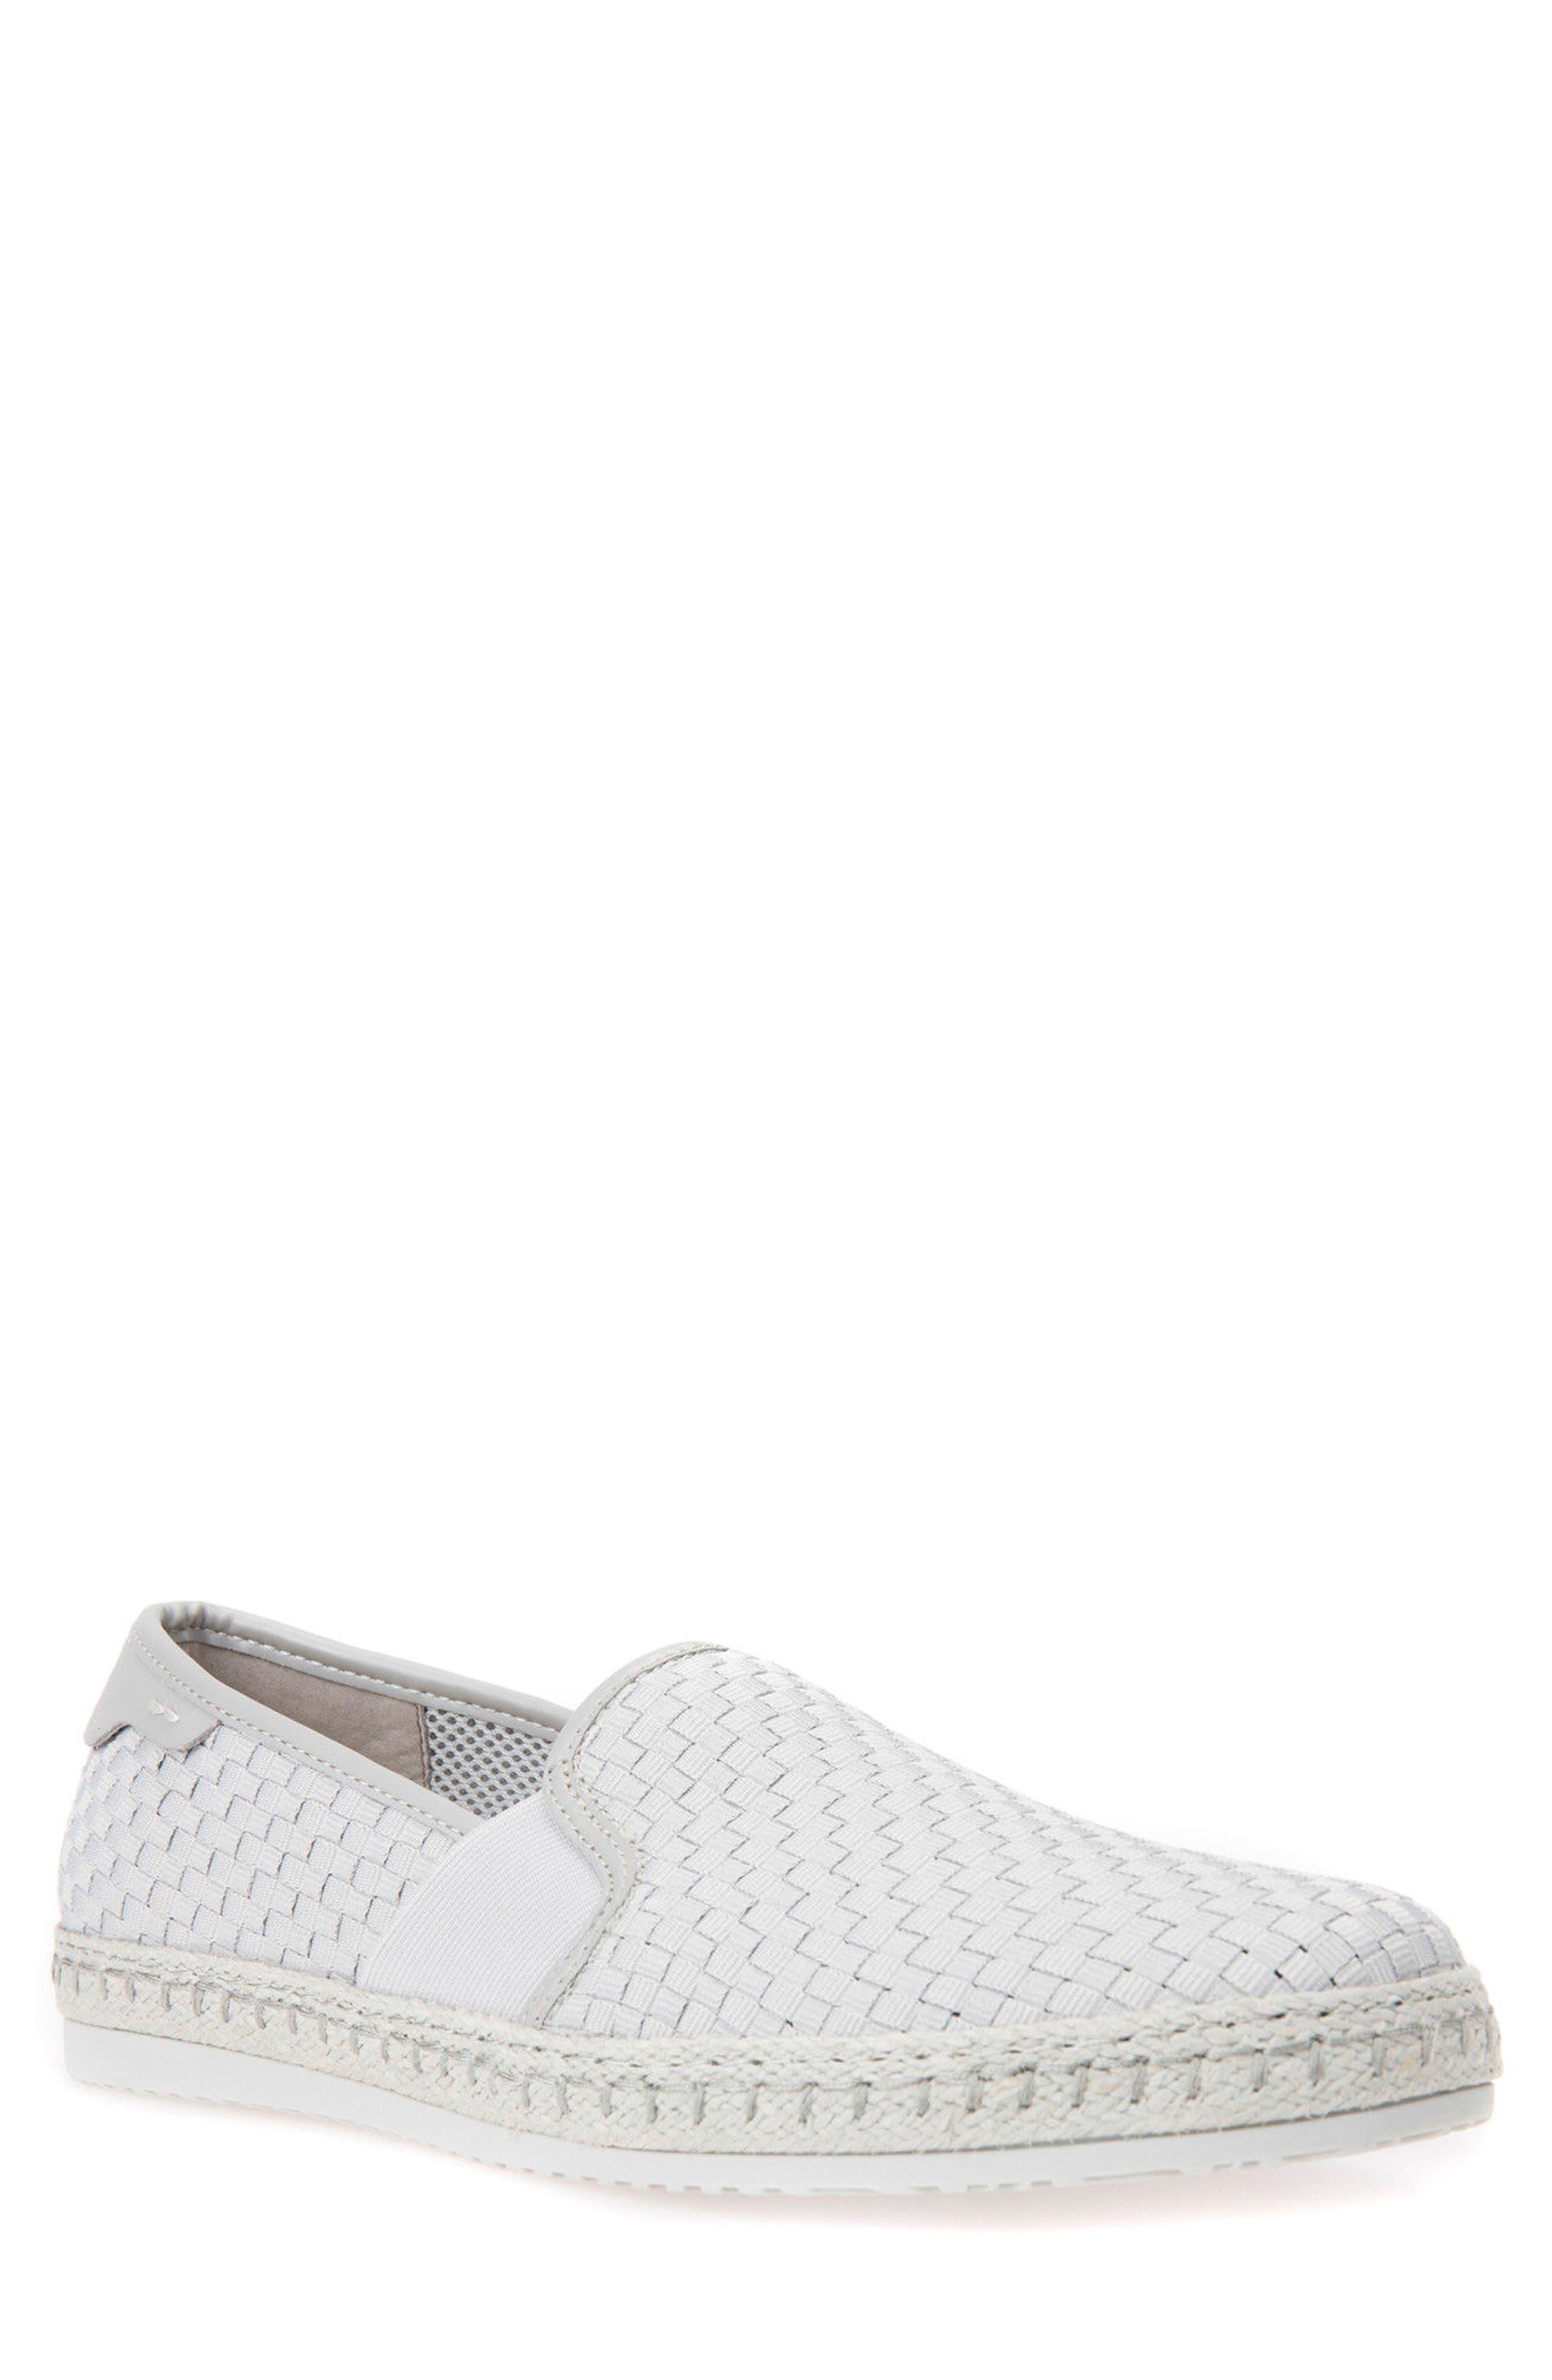 Copacaban 10 Woven Slip-On Sneaker,                         Main,                         color, 050